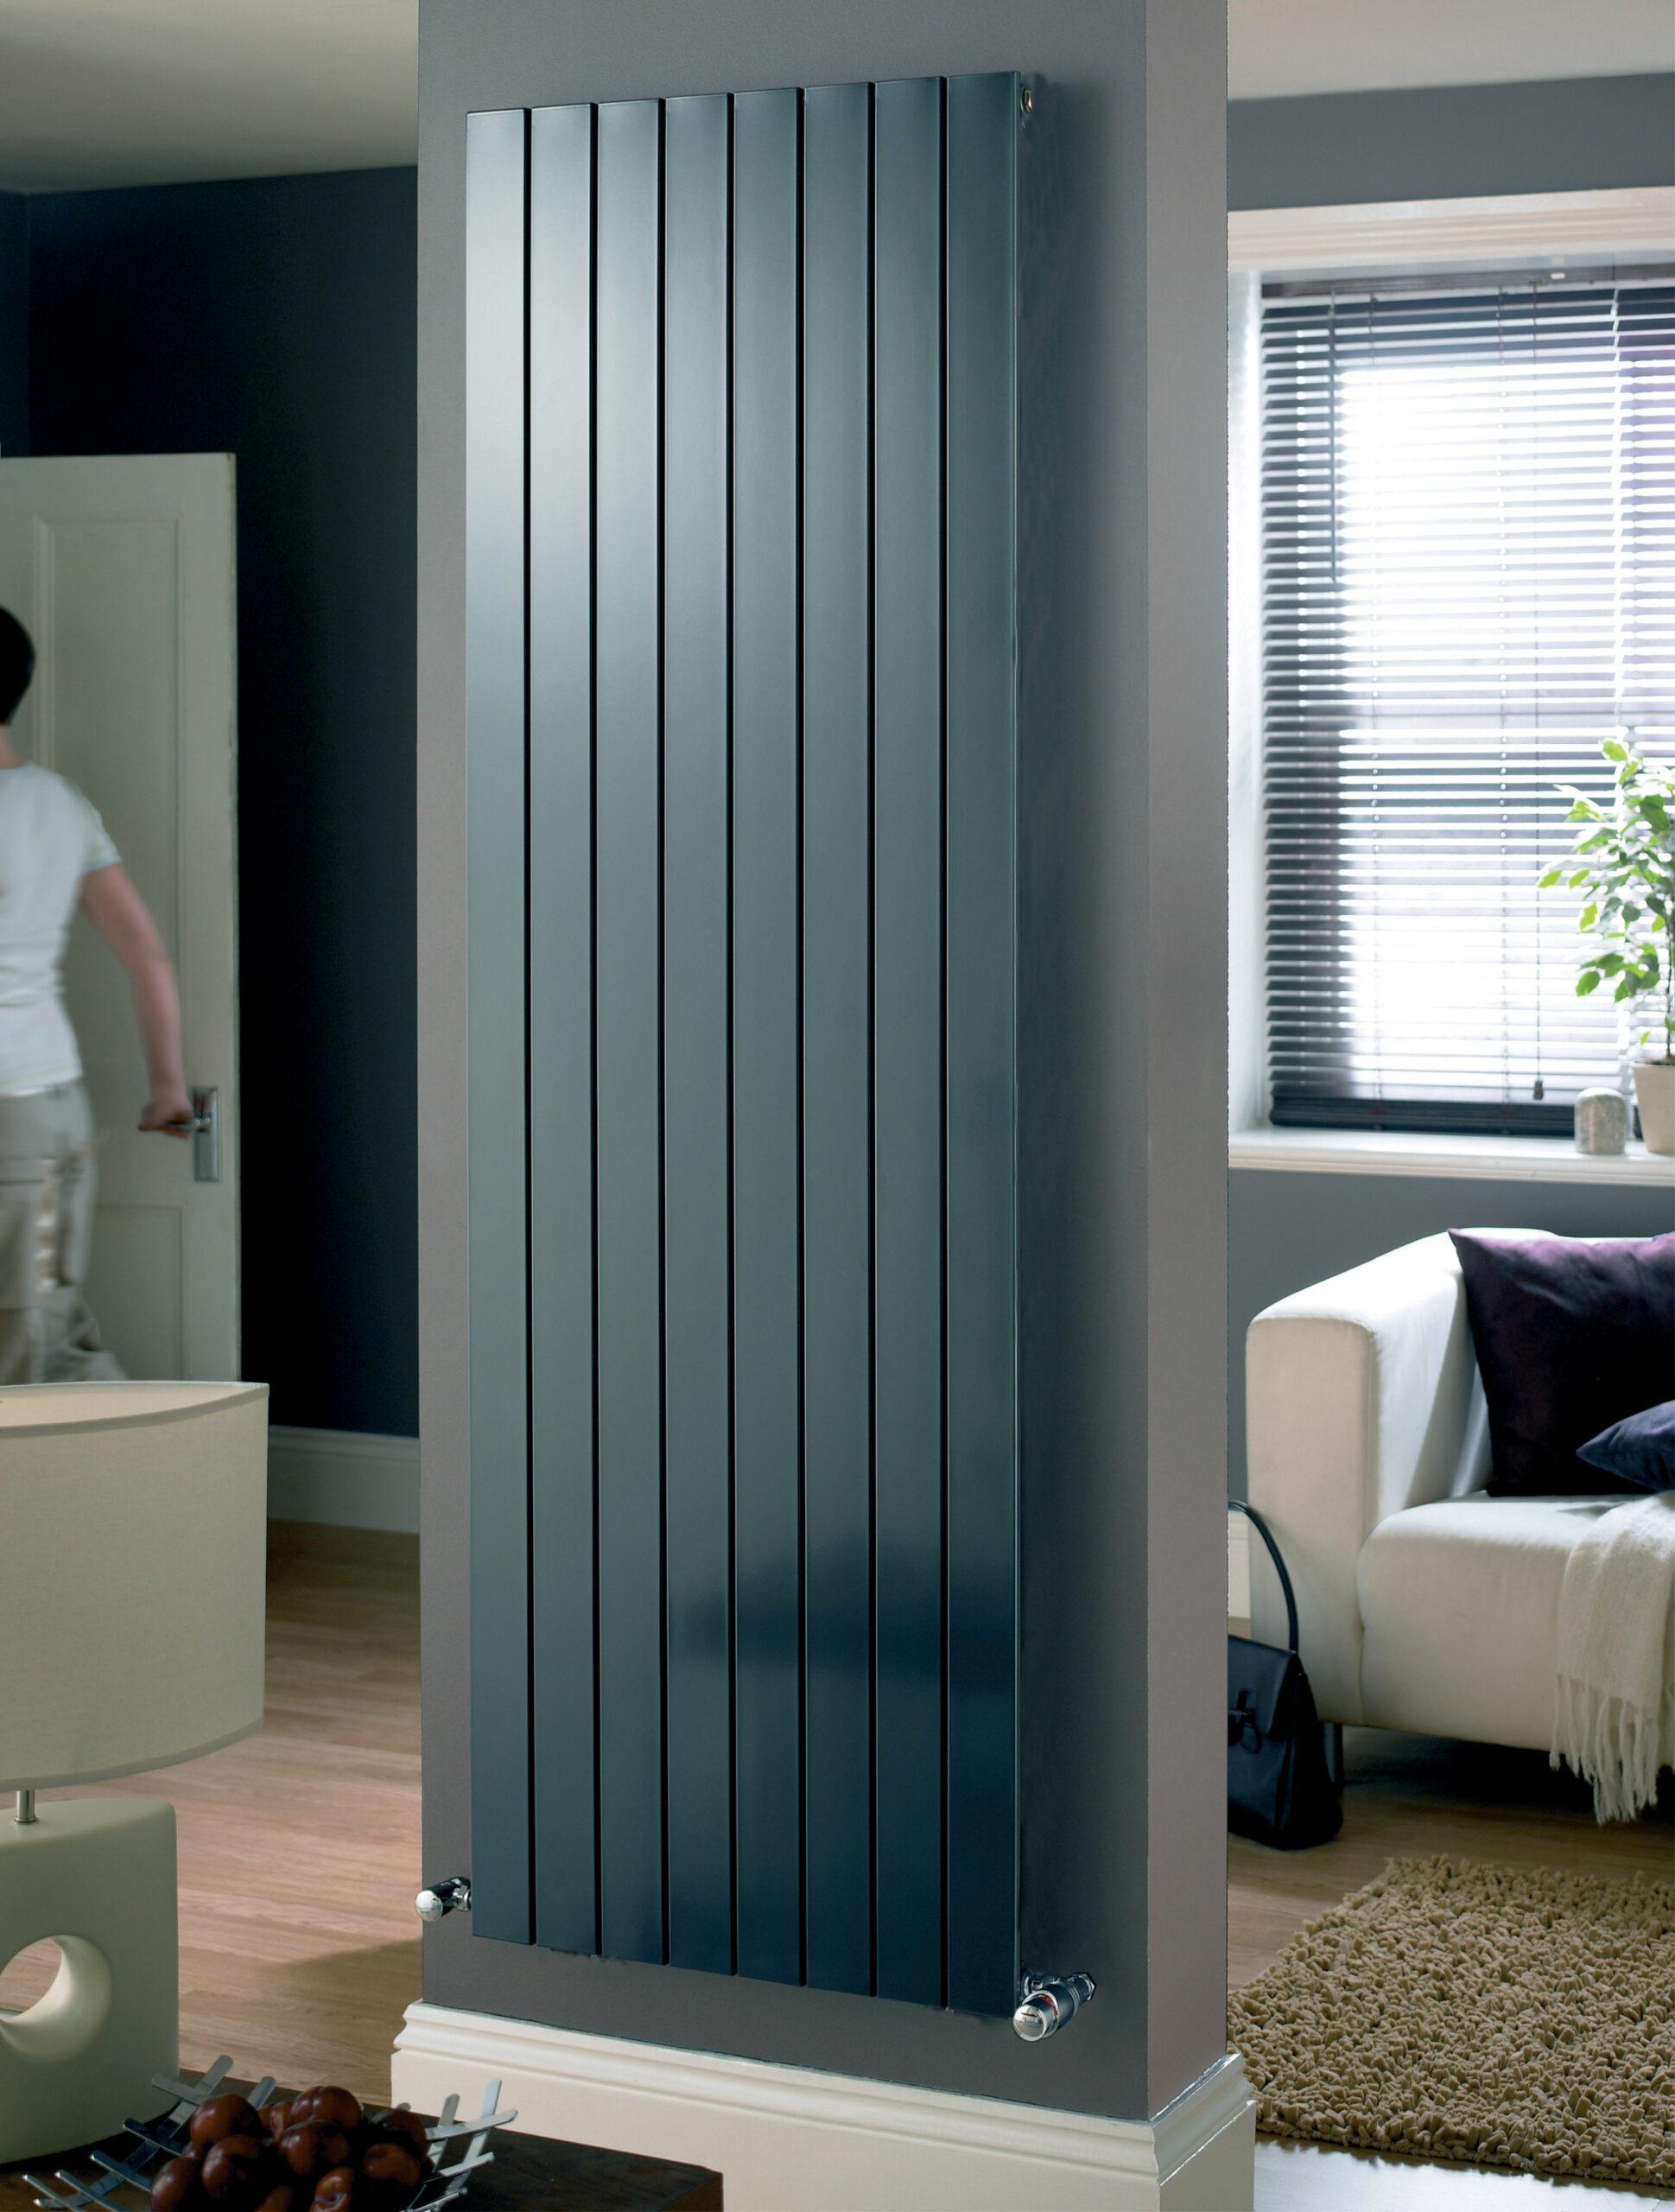 radiator ideas - Mars Single Vertical Designer Radiator